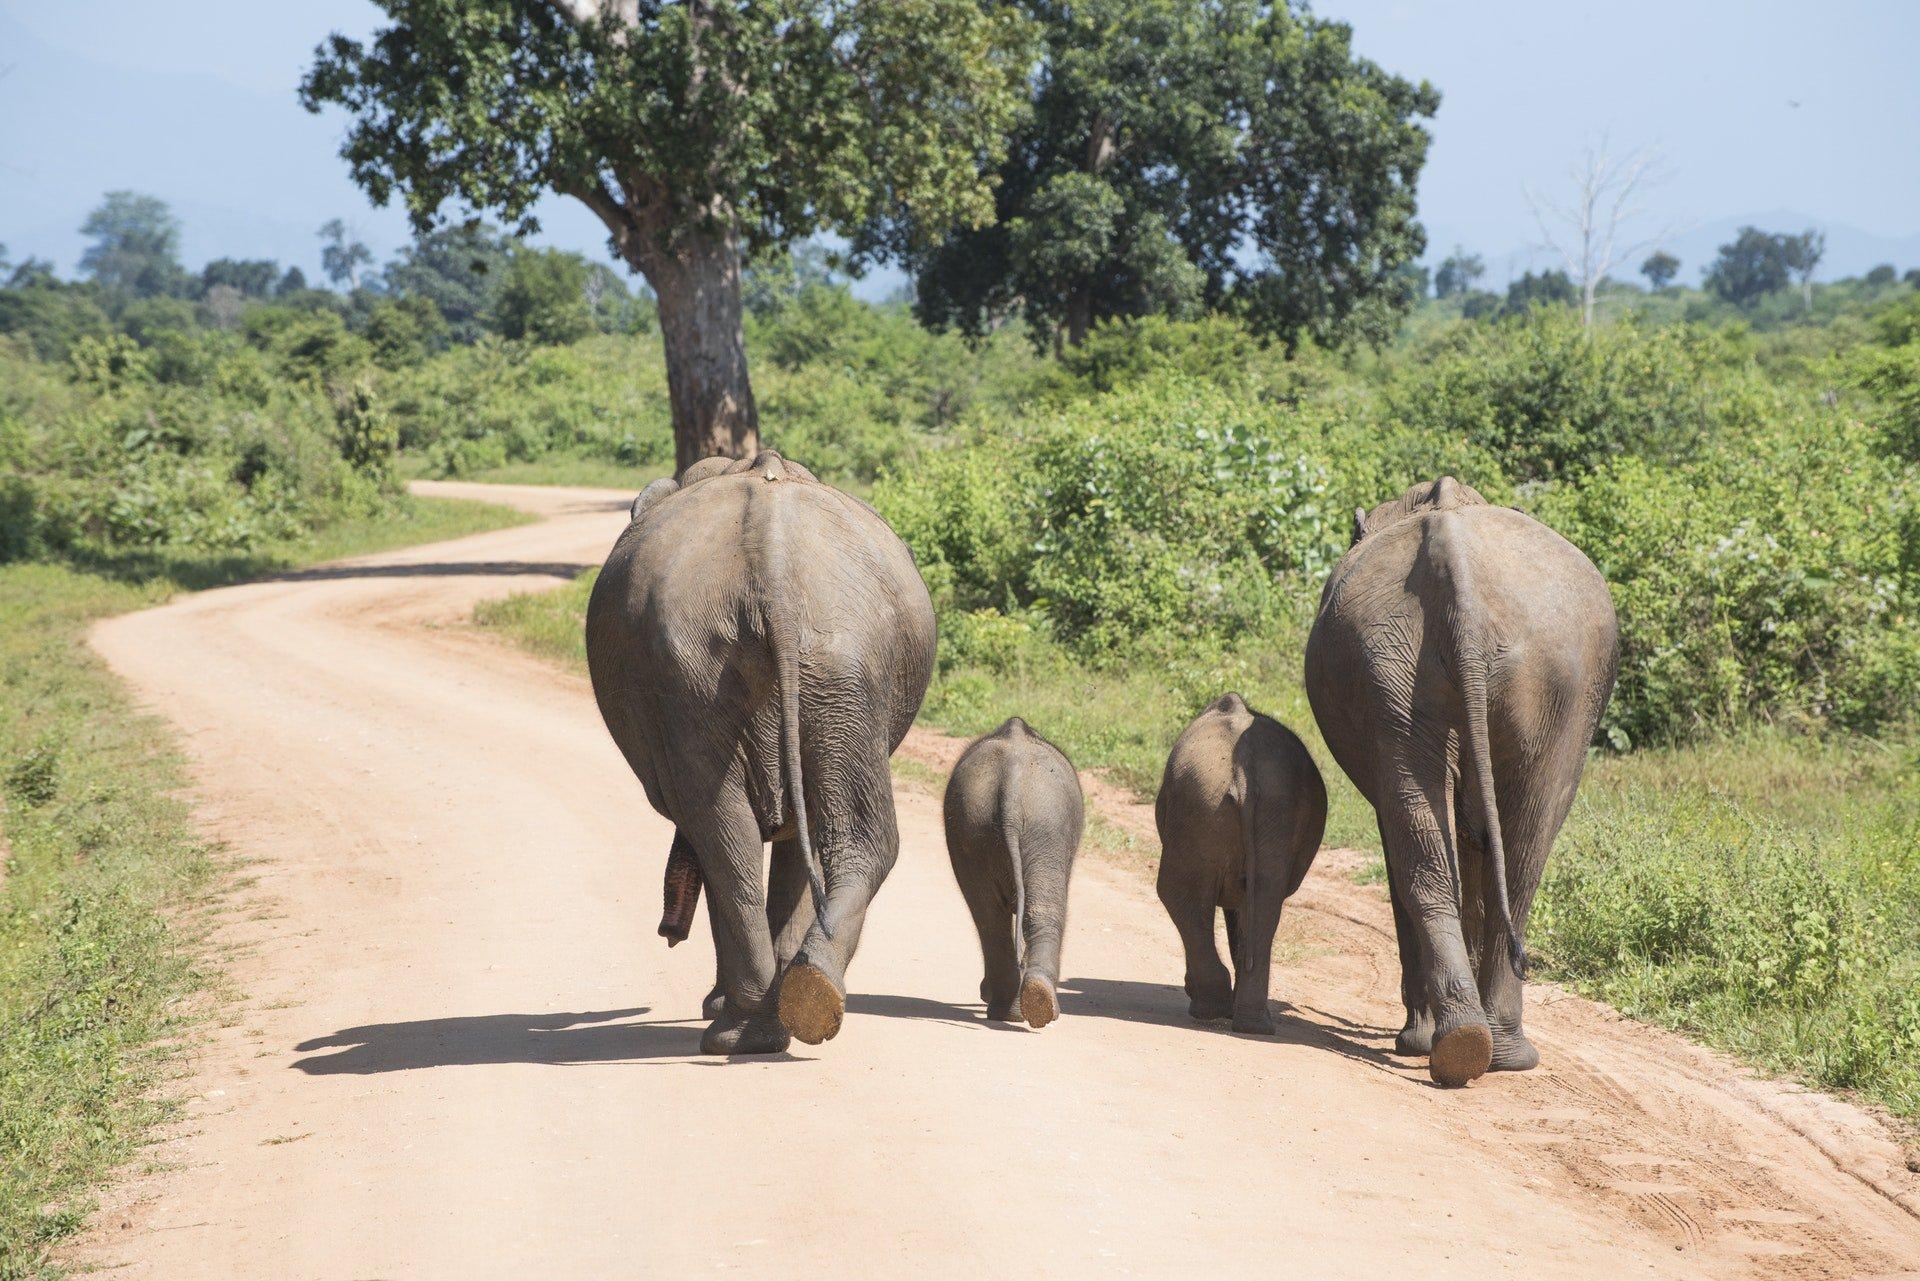 Elephants have three times as many brain cells as humans. https://t.co/b0cz2B6xWR